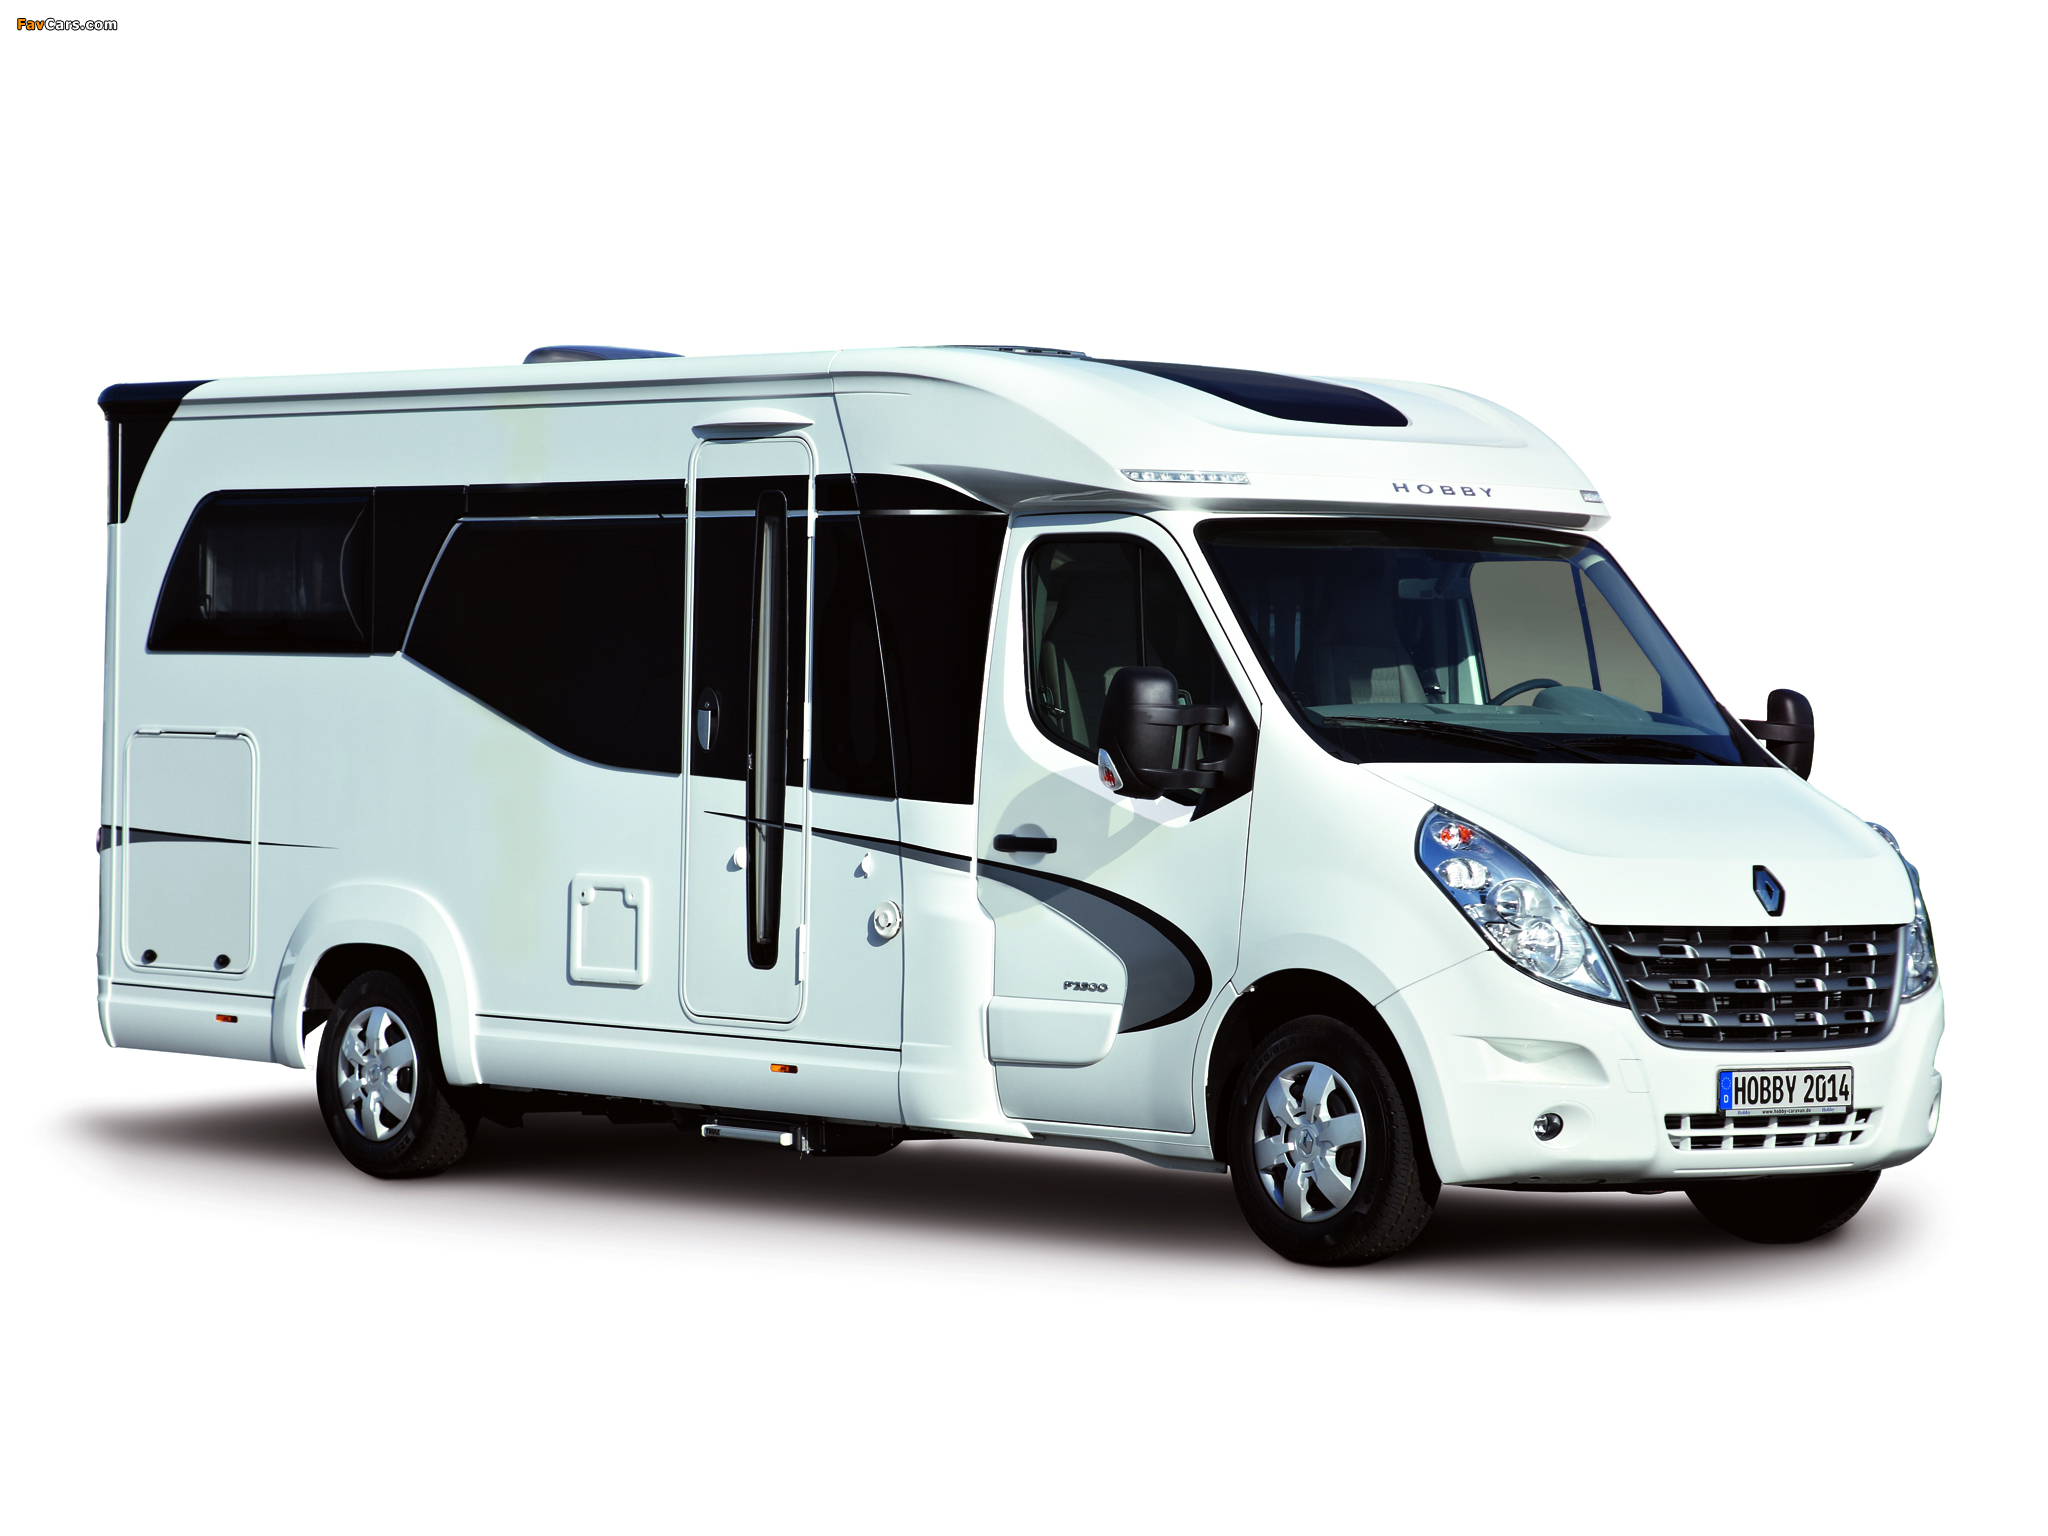 Hobby Premium Van 2013 photos (2048 x 1536)